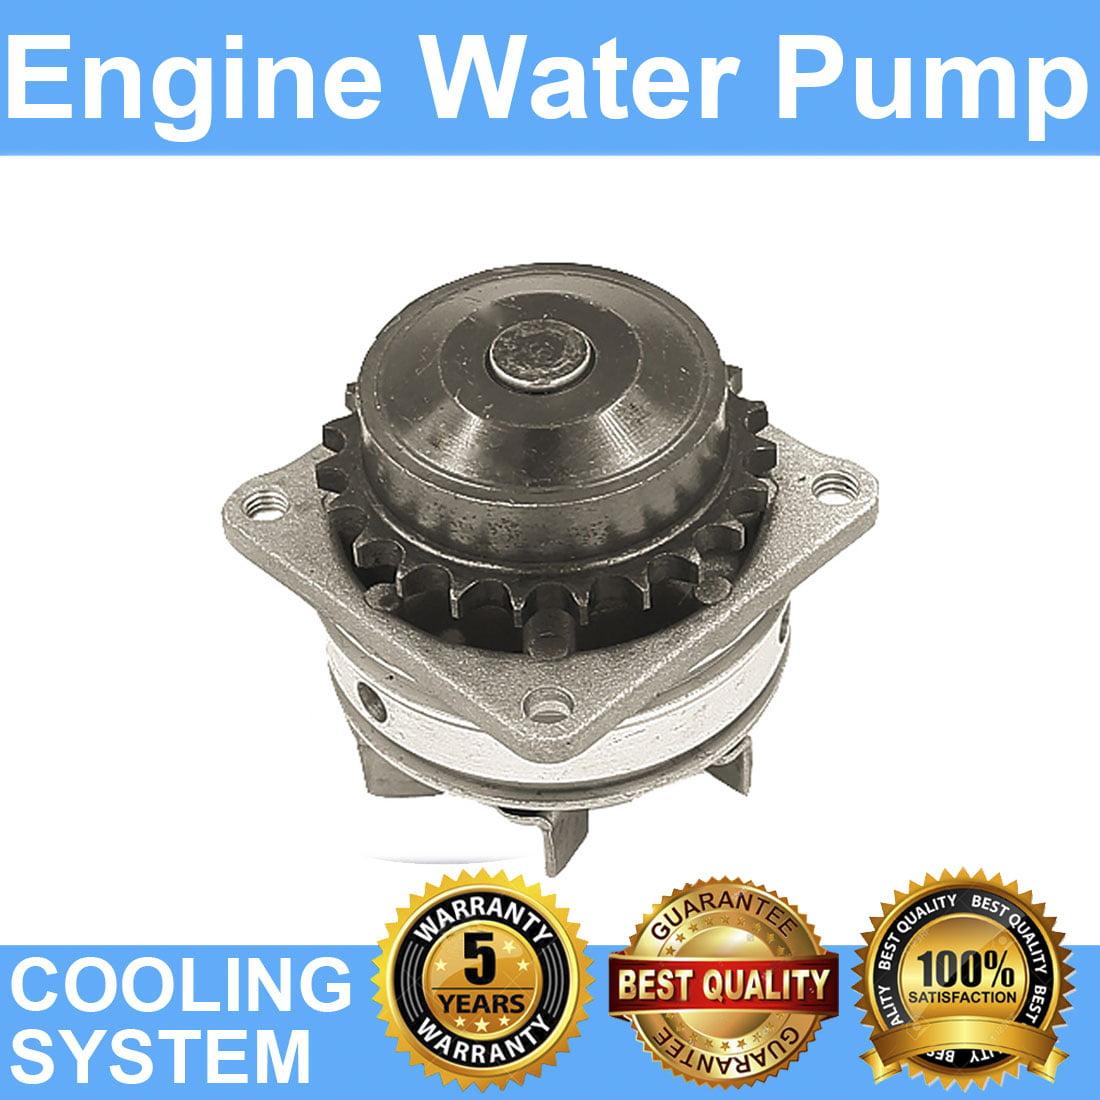 Engine Water Pump For 1996-2003 Infiniti I30 V6 Infiniti QX4 V6 Nissan Maxima V6 by Bargain Outlet